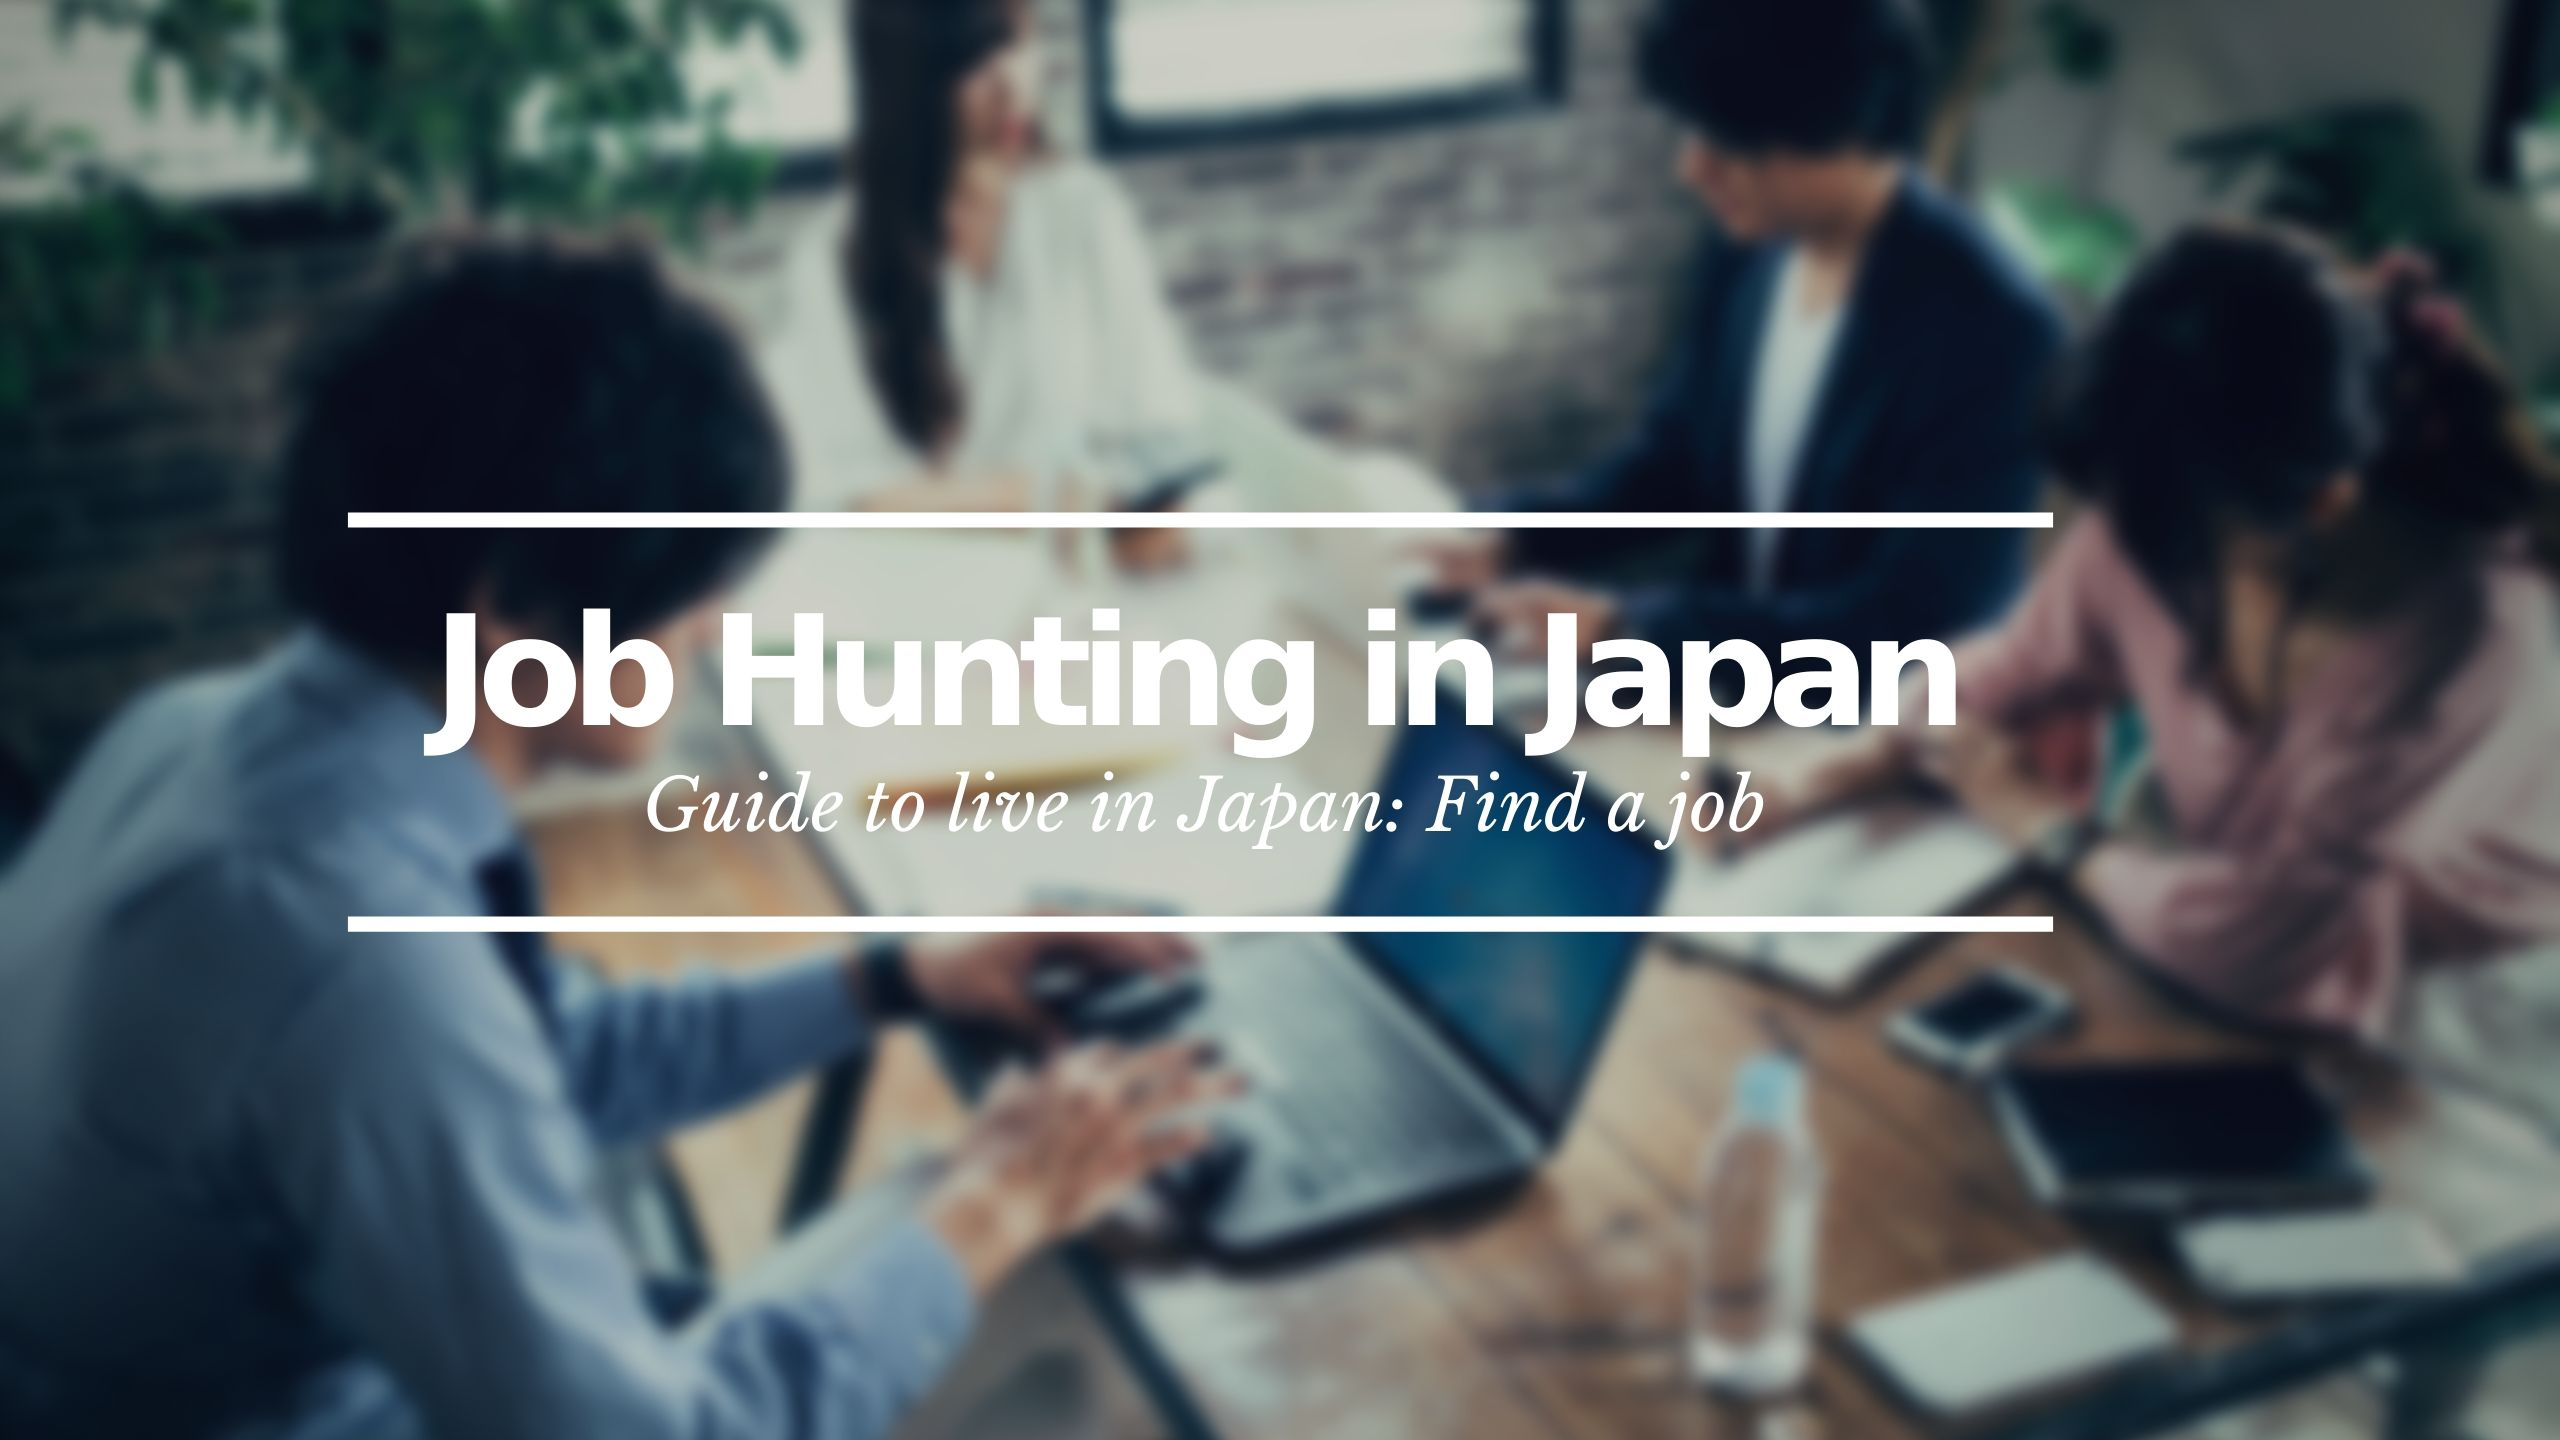 Jon Hunting Japan